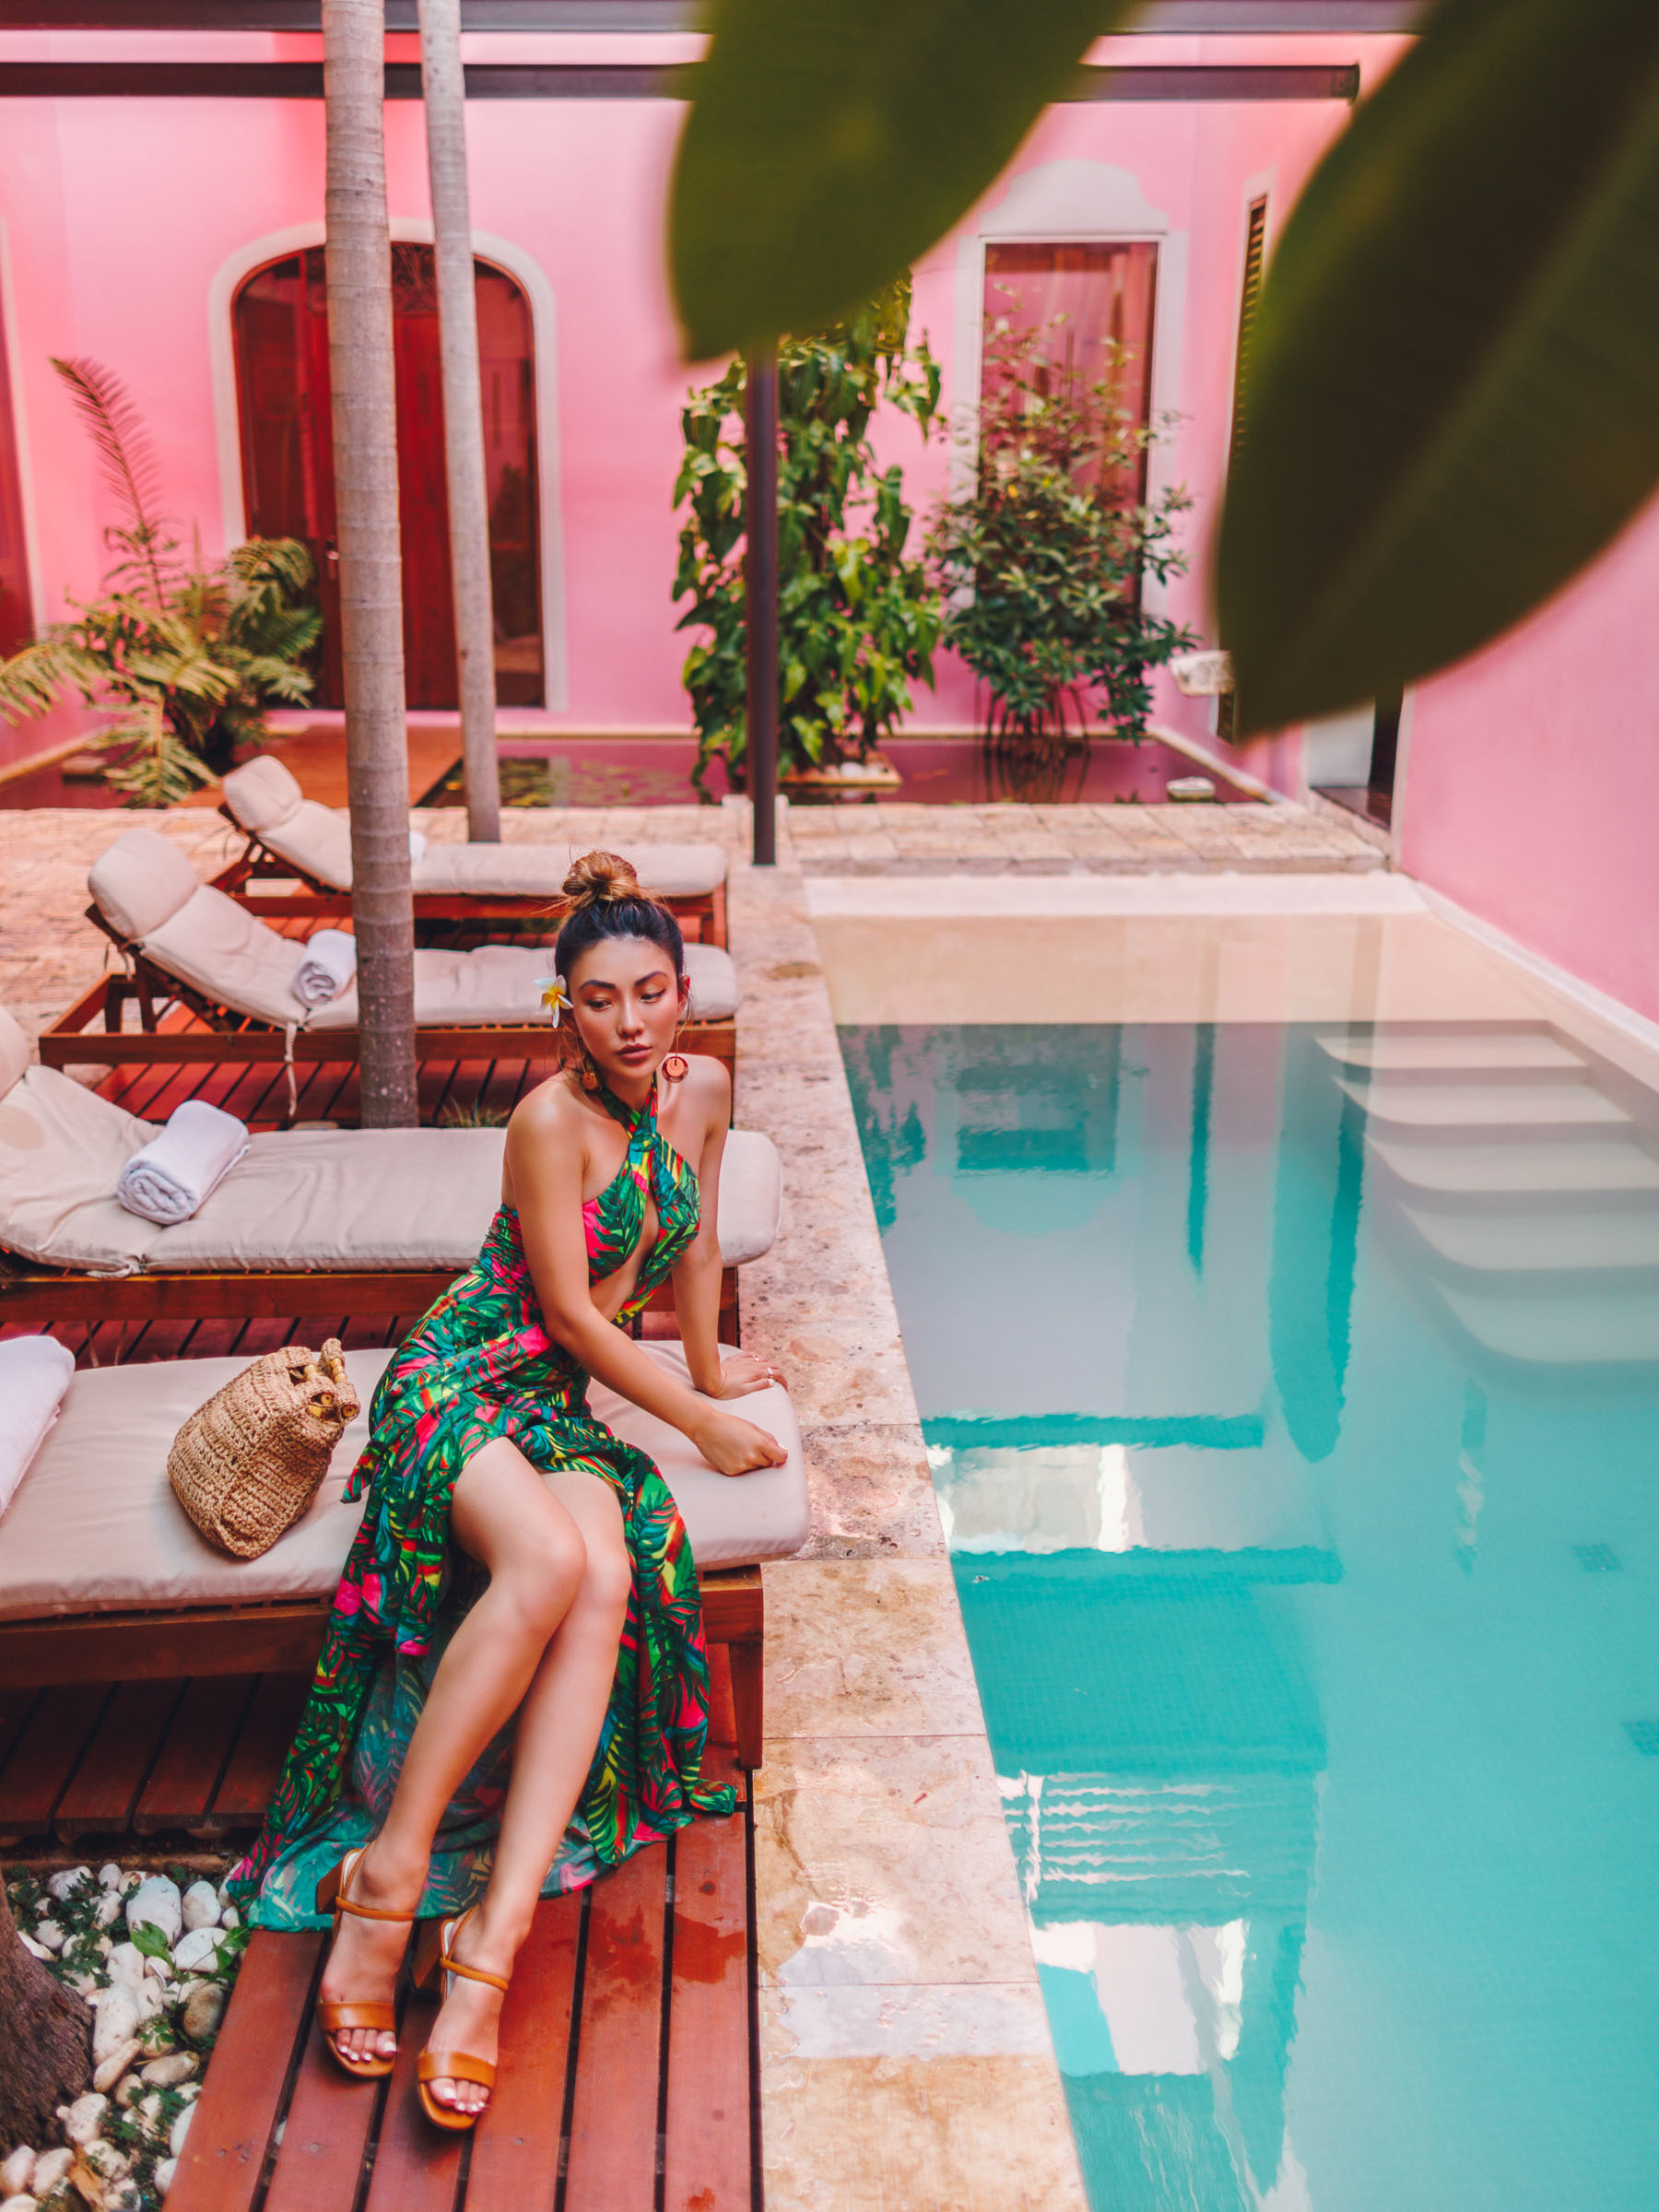 wear a bra without a dress, cutout dress, tropical style, Fregoli Feather Clutch, tropical print dress // Notjessfashion.com